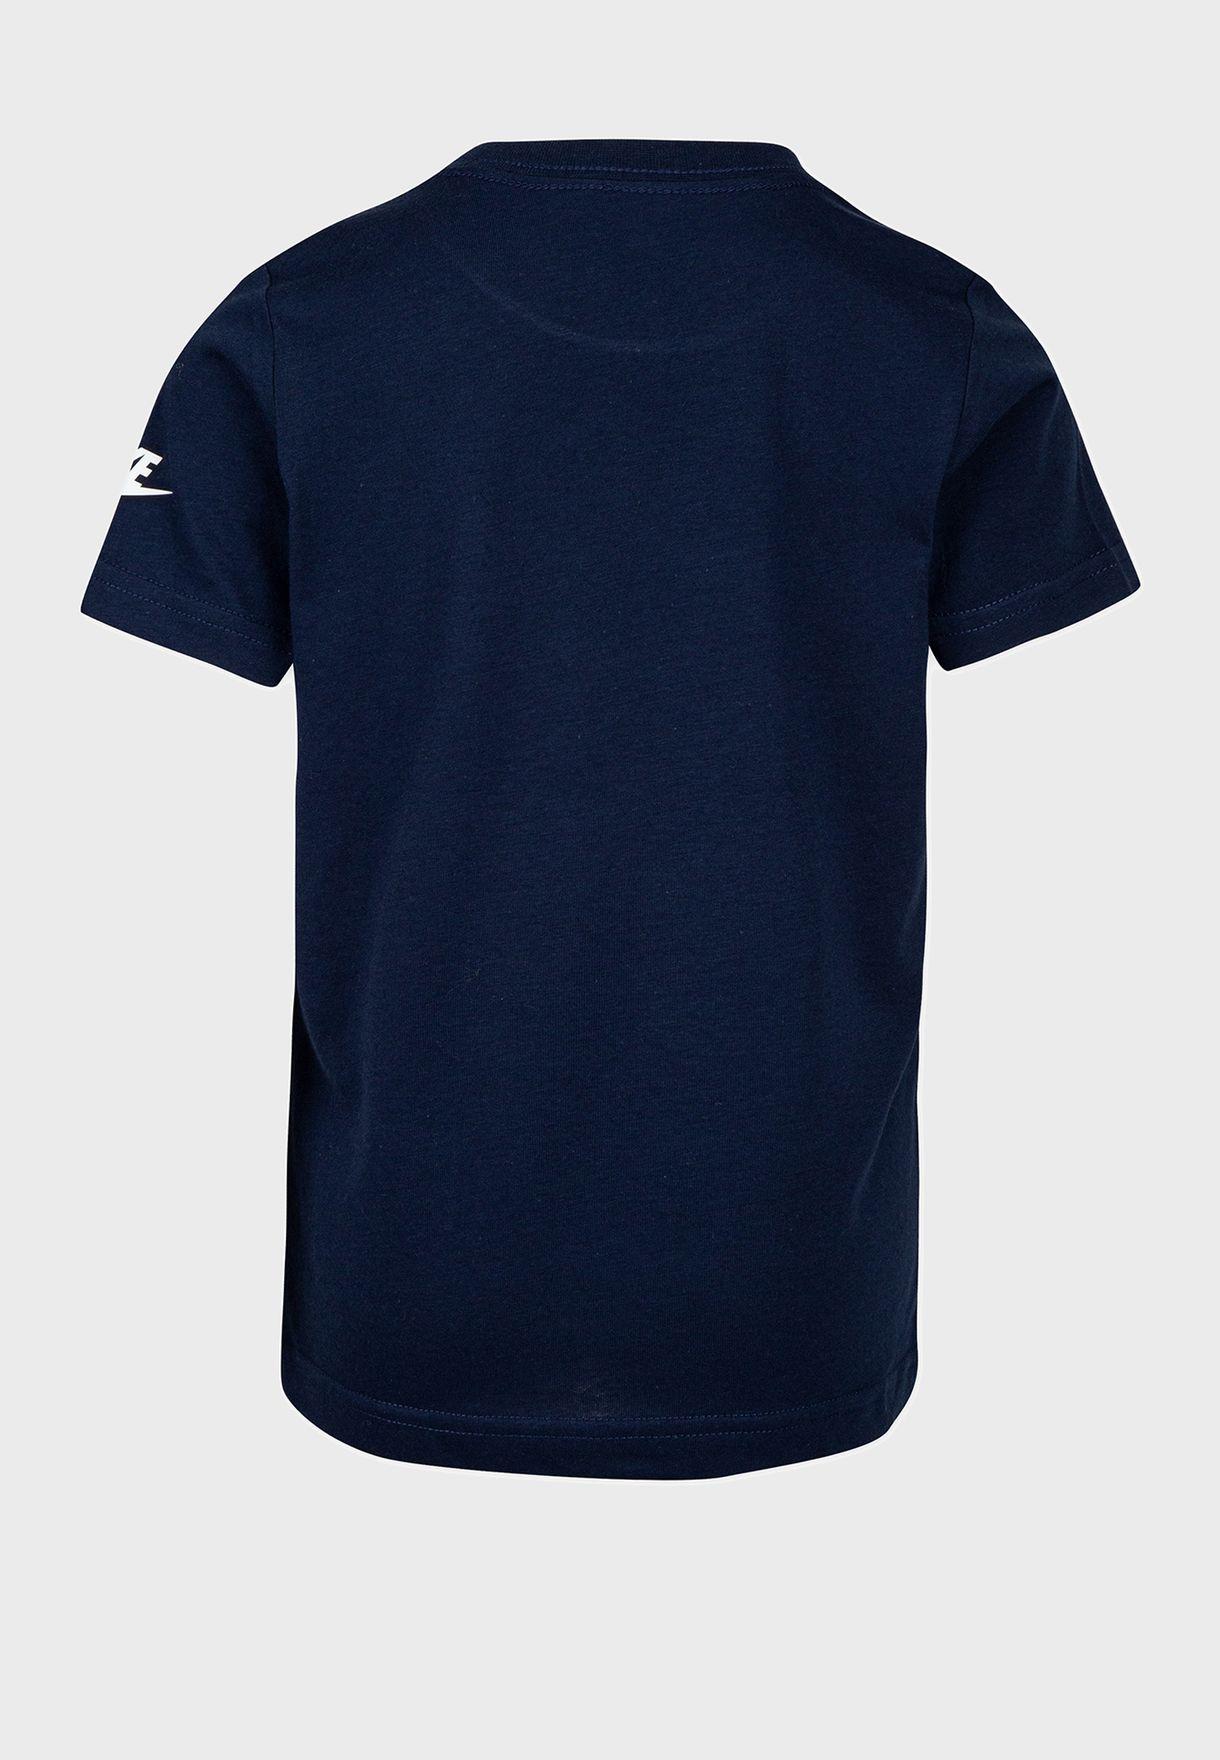 Kids Just Do It Shoebox T-Shirt